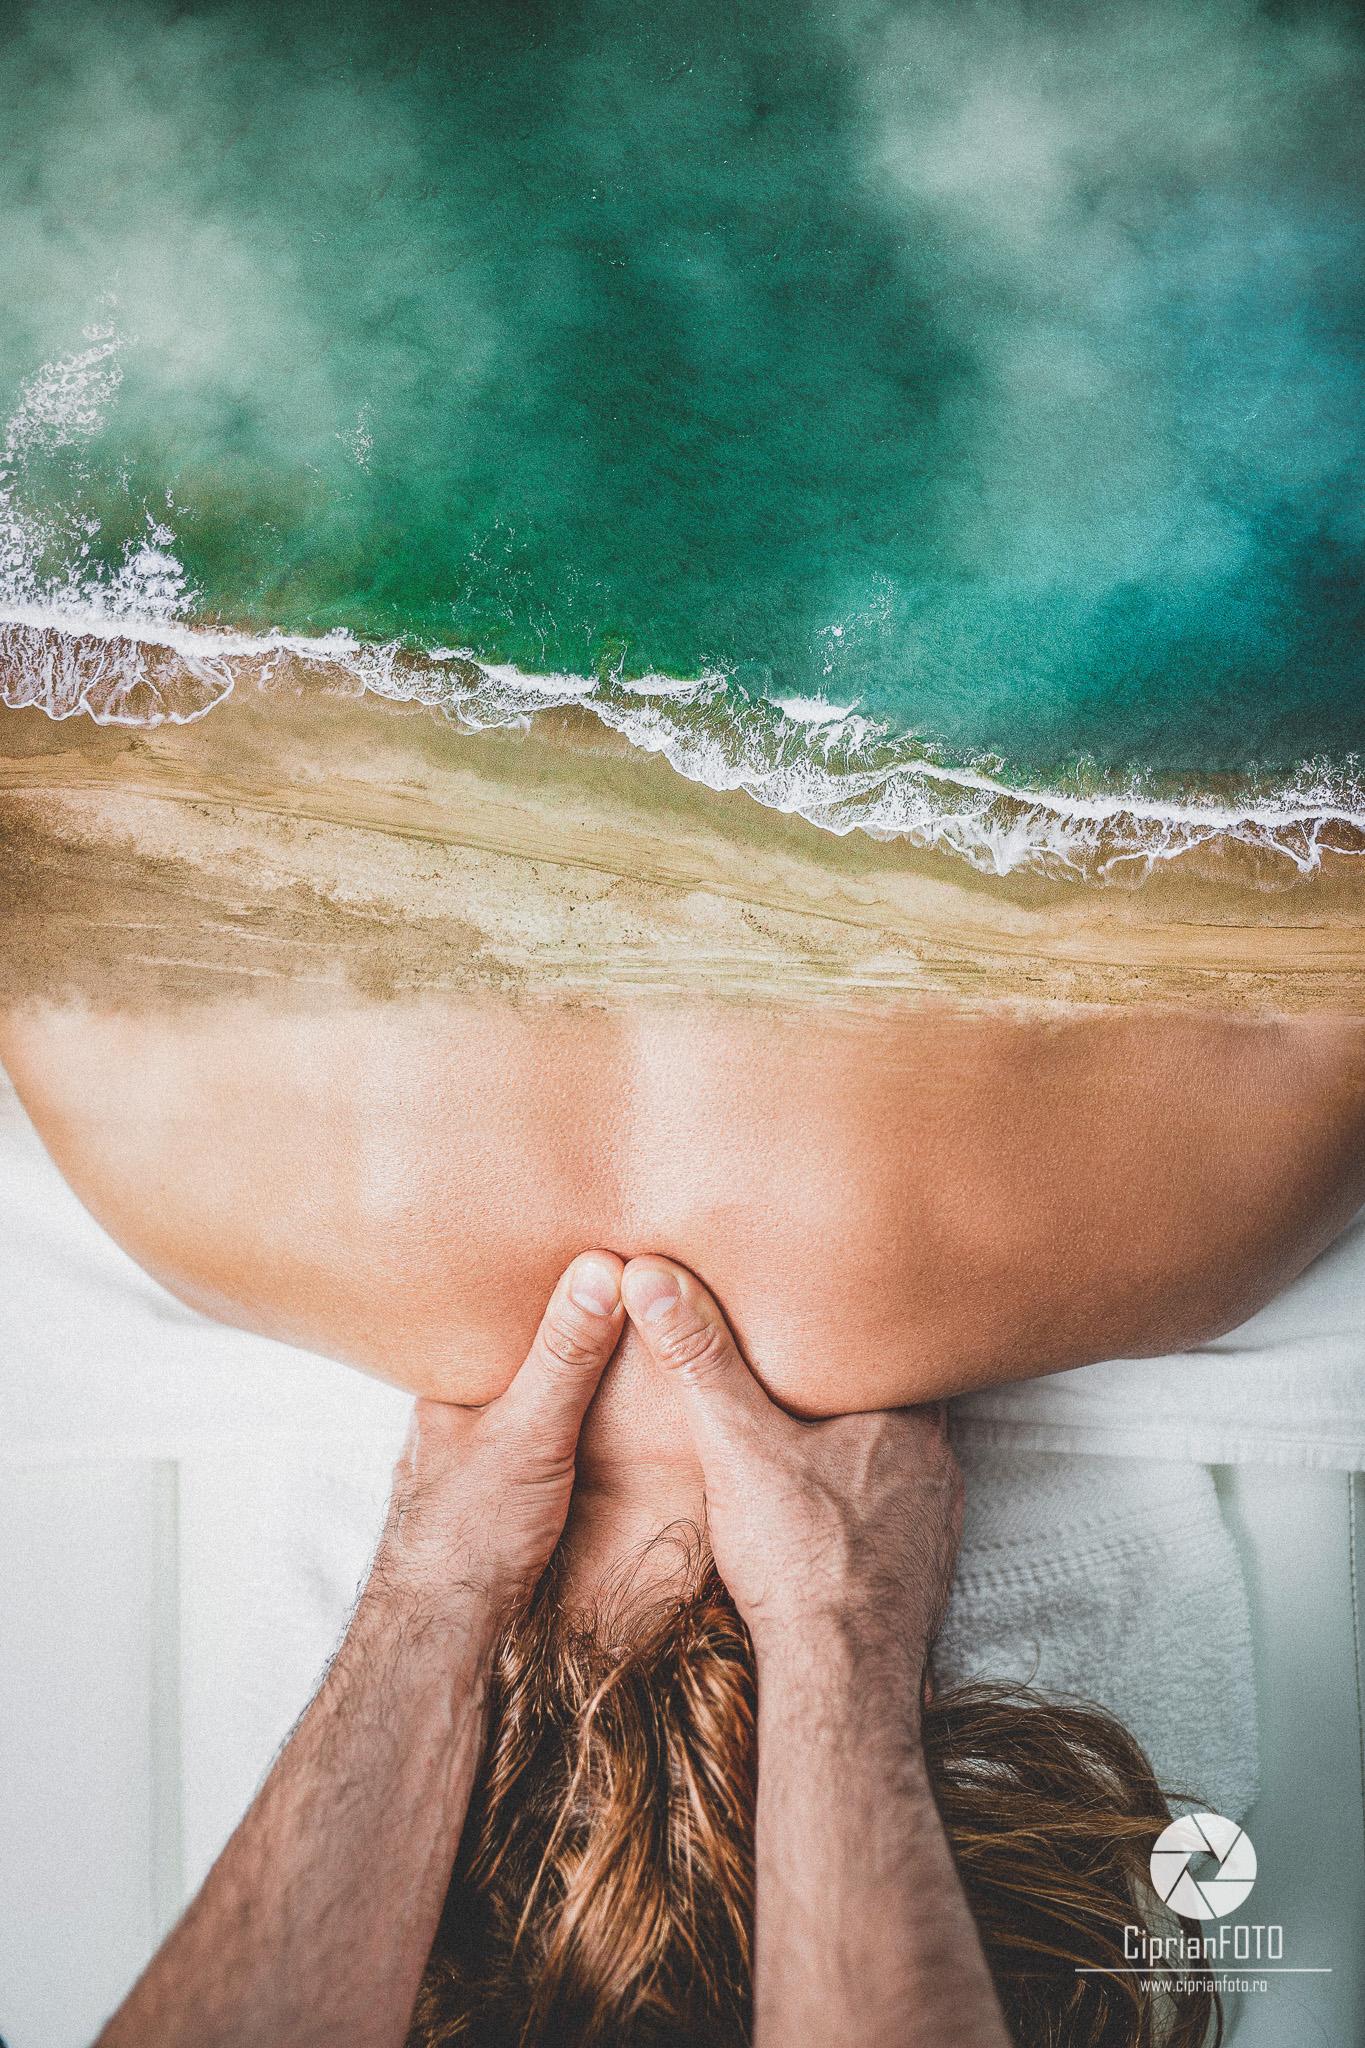 Fantasy, Surreal, Aerial Beach, Photo Manipulation, Photoshop Tutorial Ideas, CiprianFOTO, Ciprian FOTO